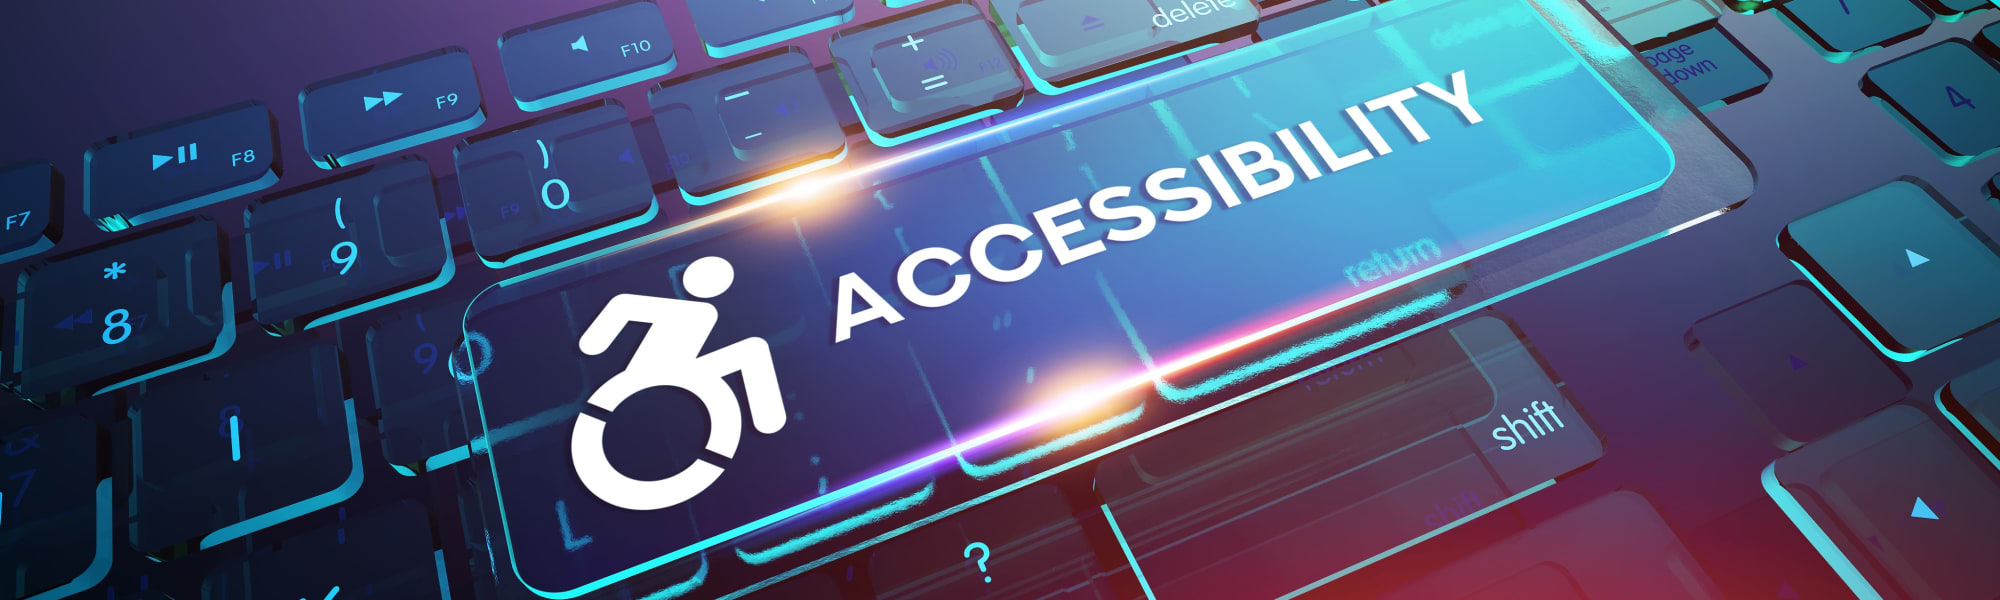 Accessibility policy for Olympus Encantada in Albuquerque, New Mexico